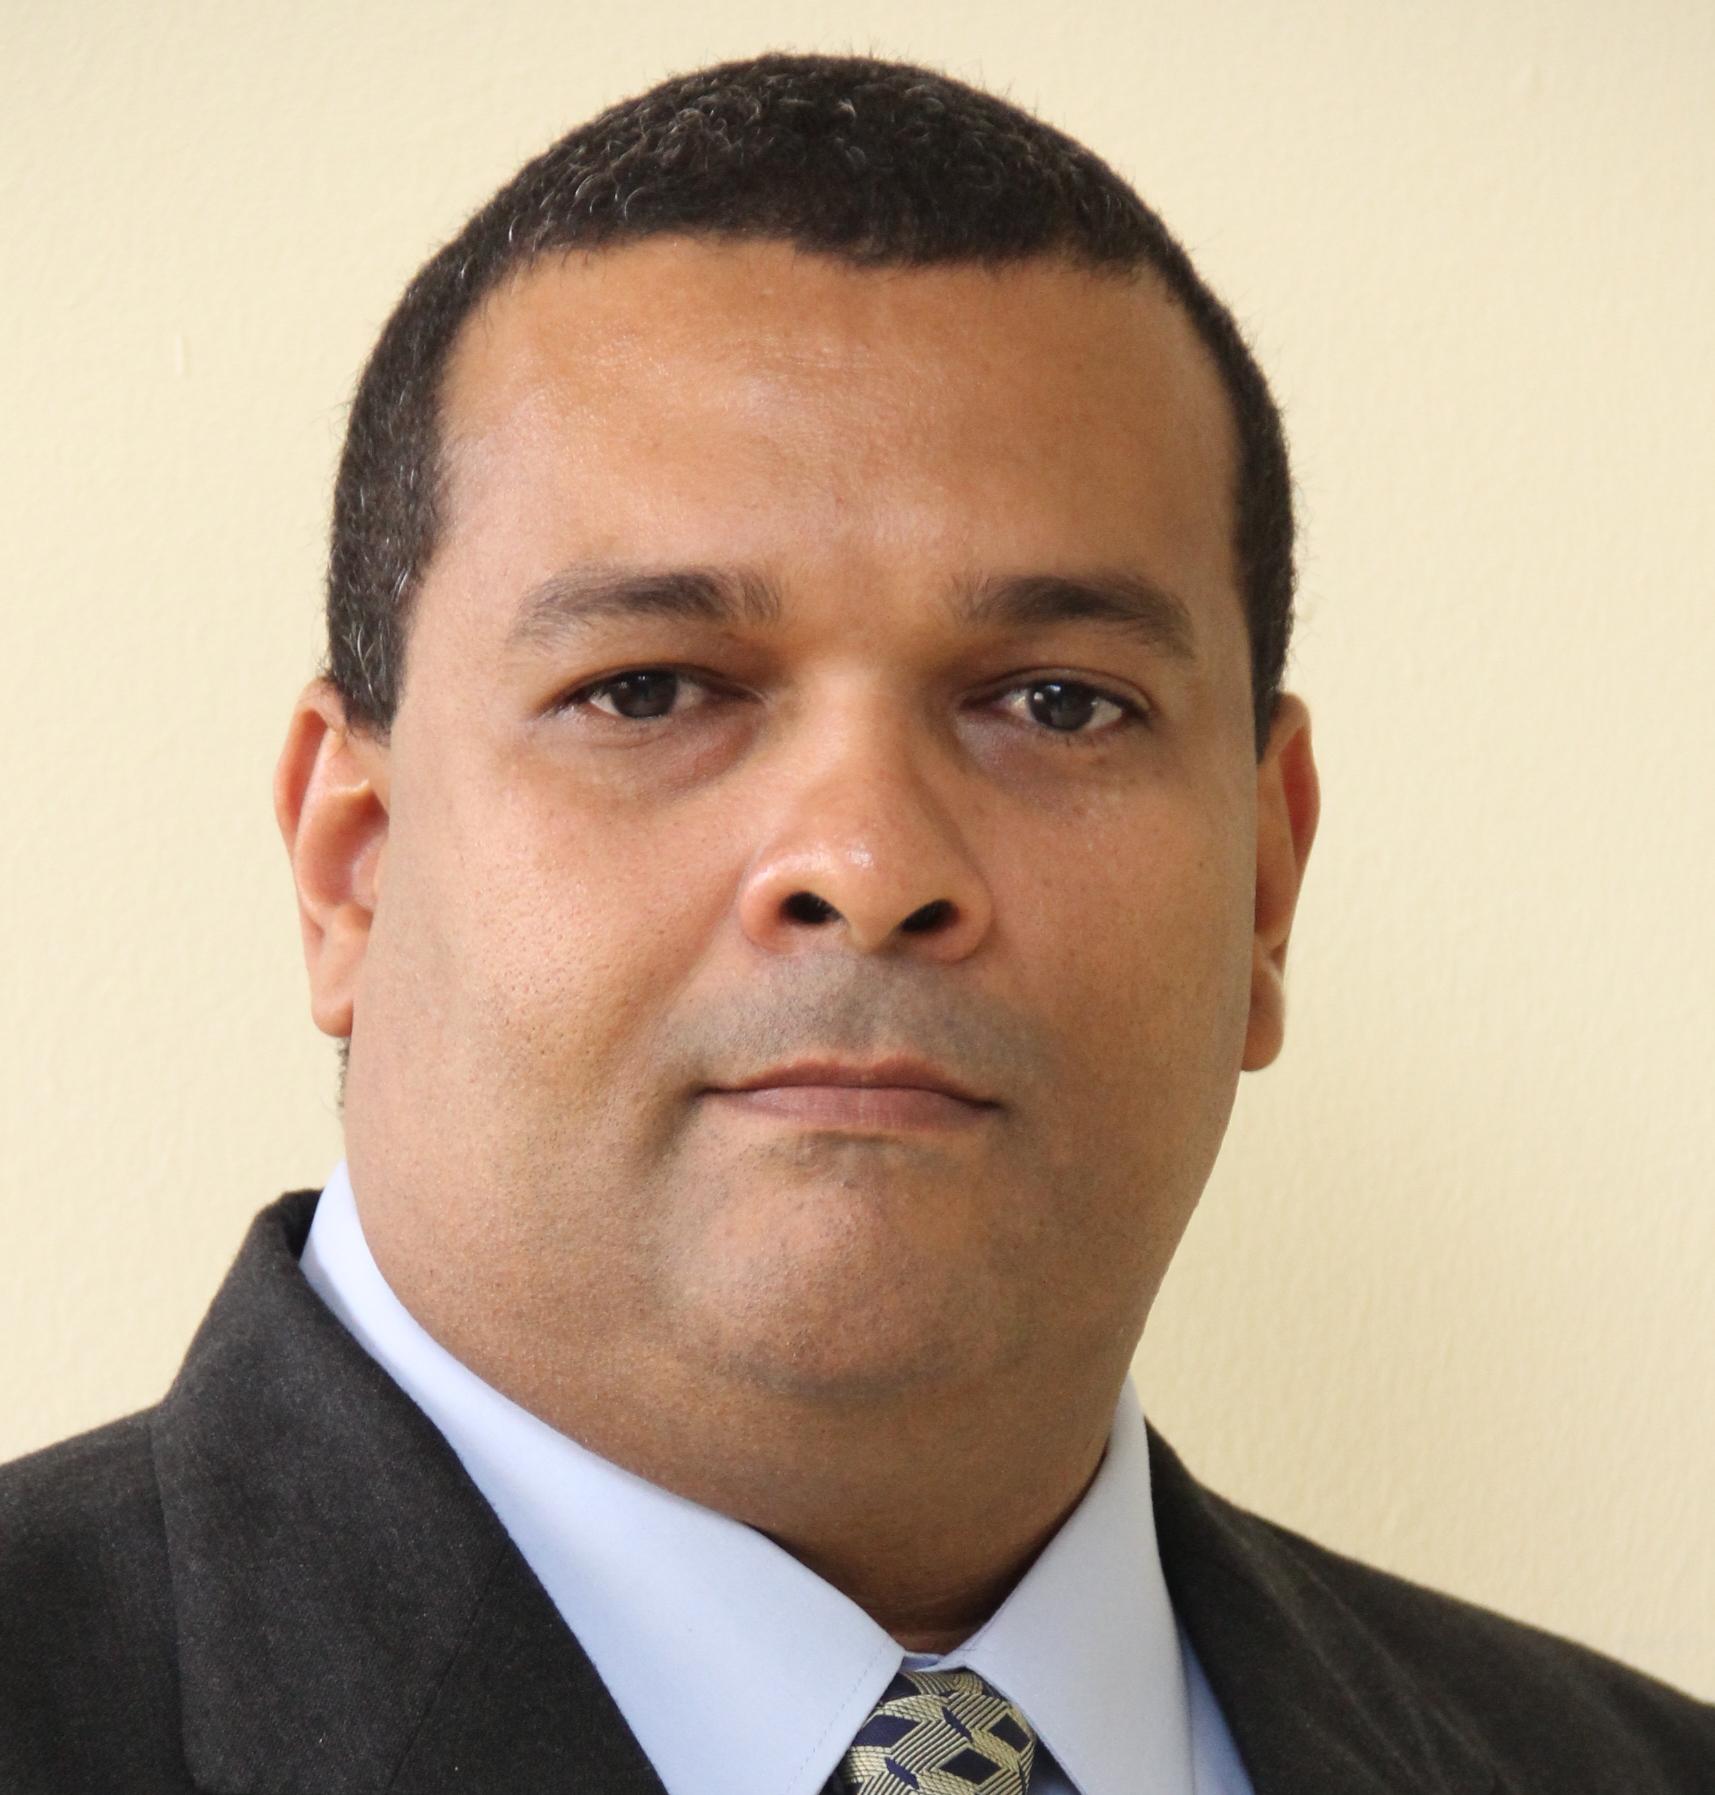 Pablo Montero Prado